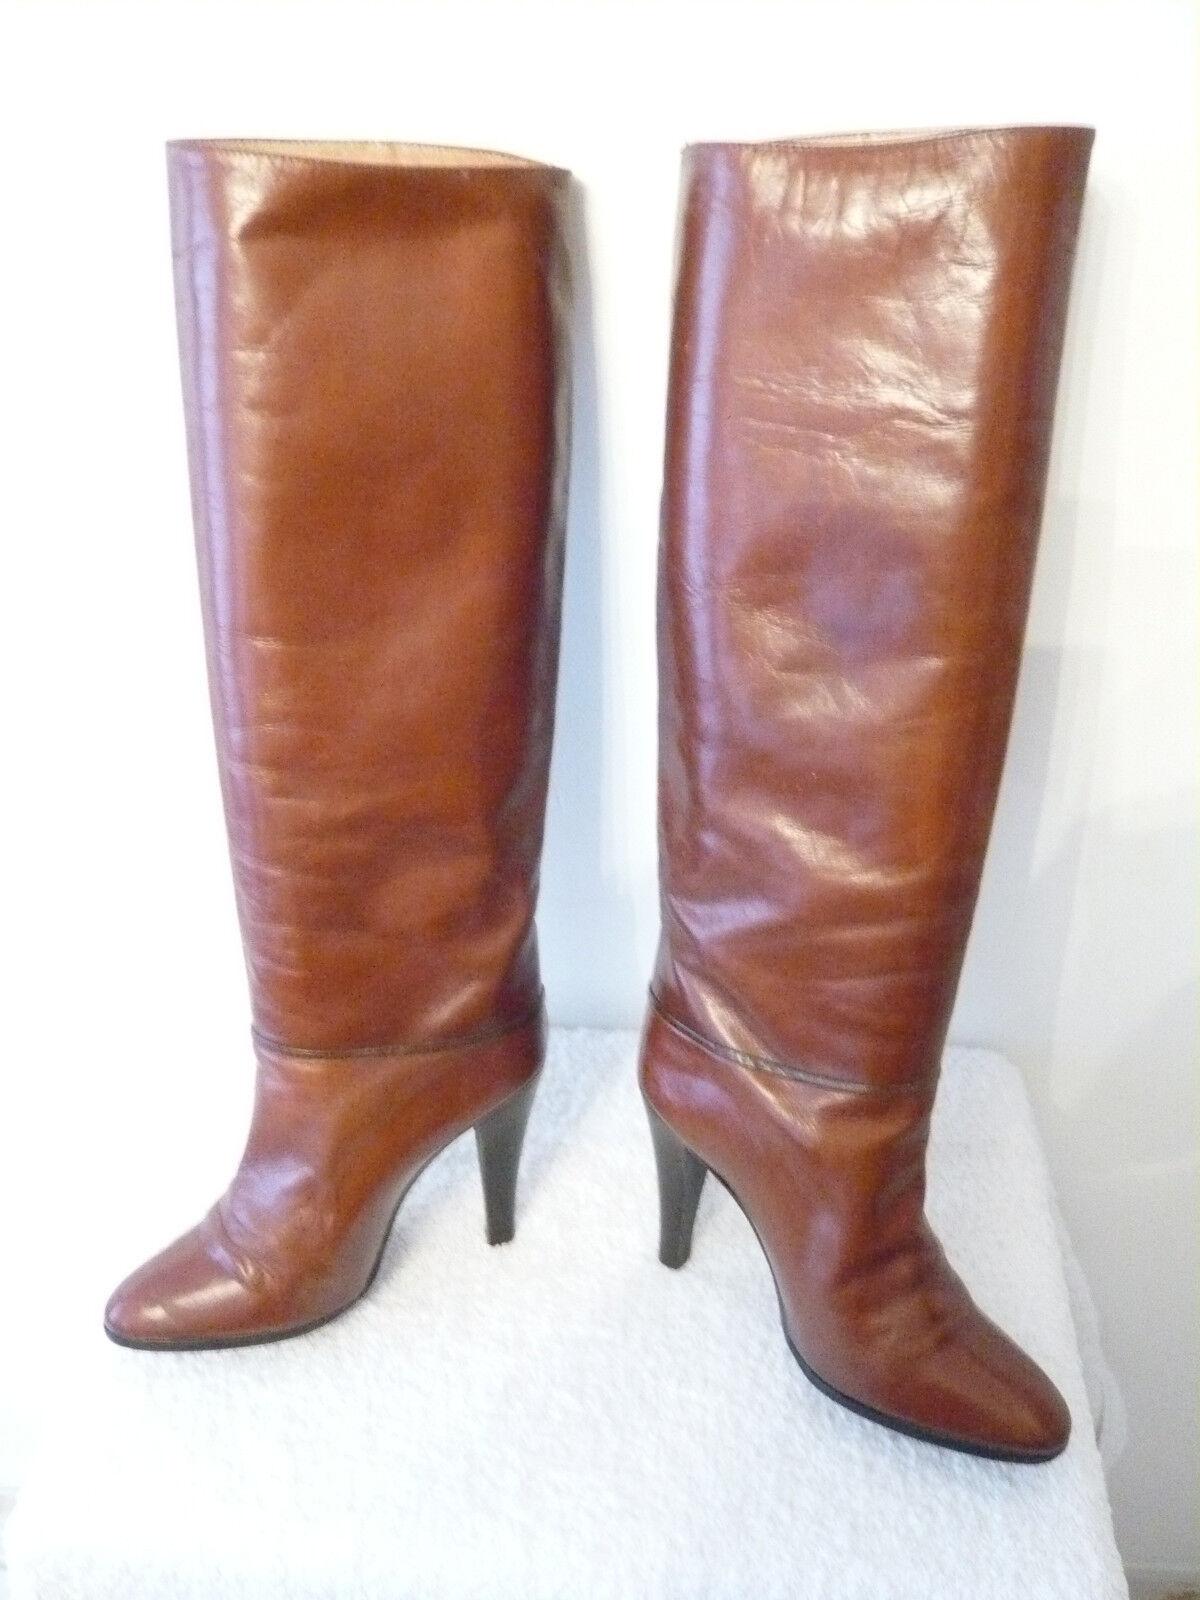 Stiefel Stiefel Stiefel vintage 1982  Gold  - RENE MANCINI --- T. 38 885c94